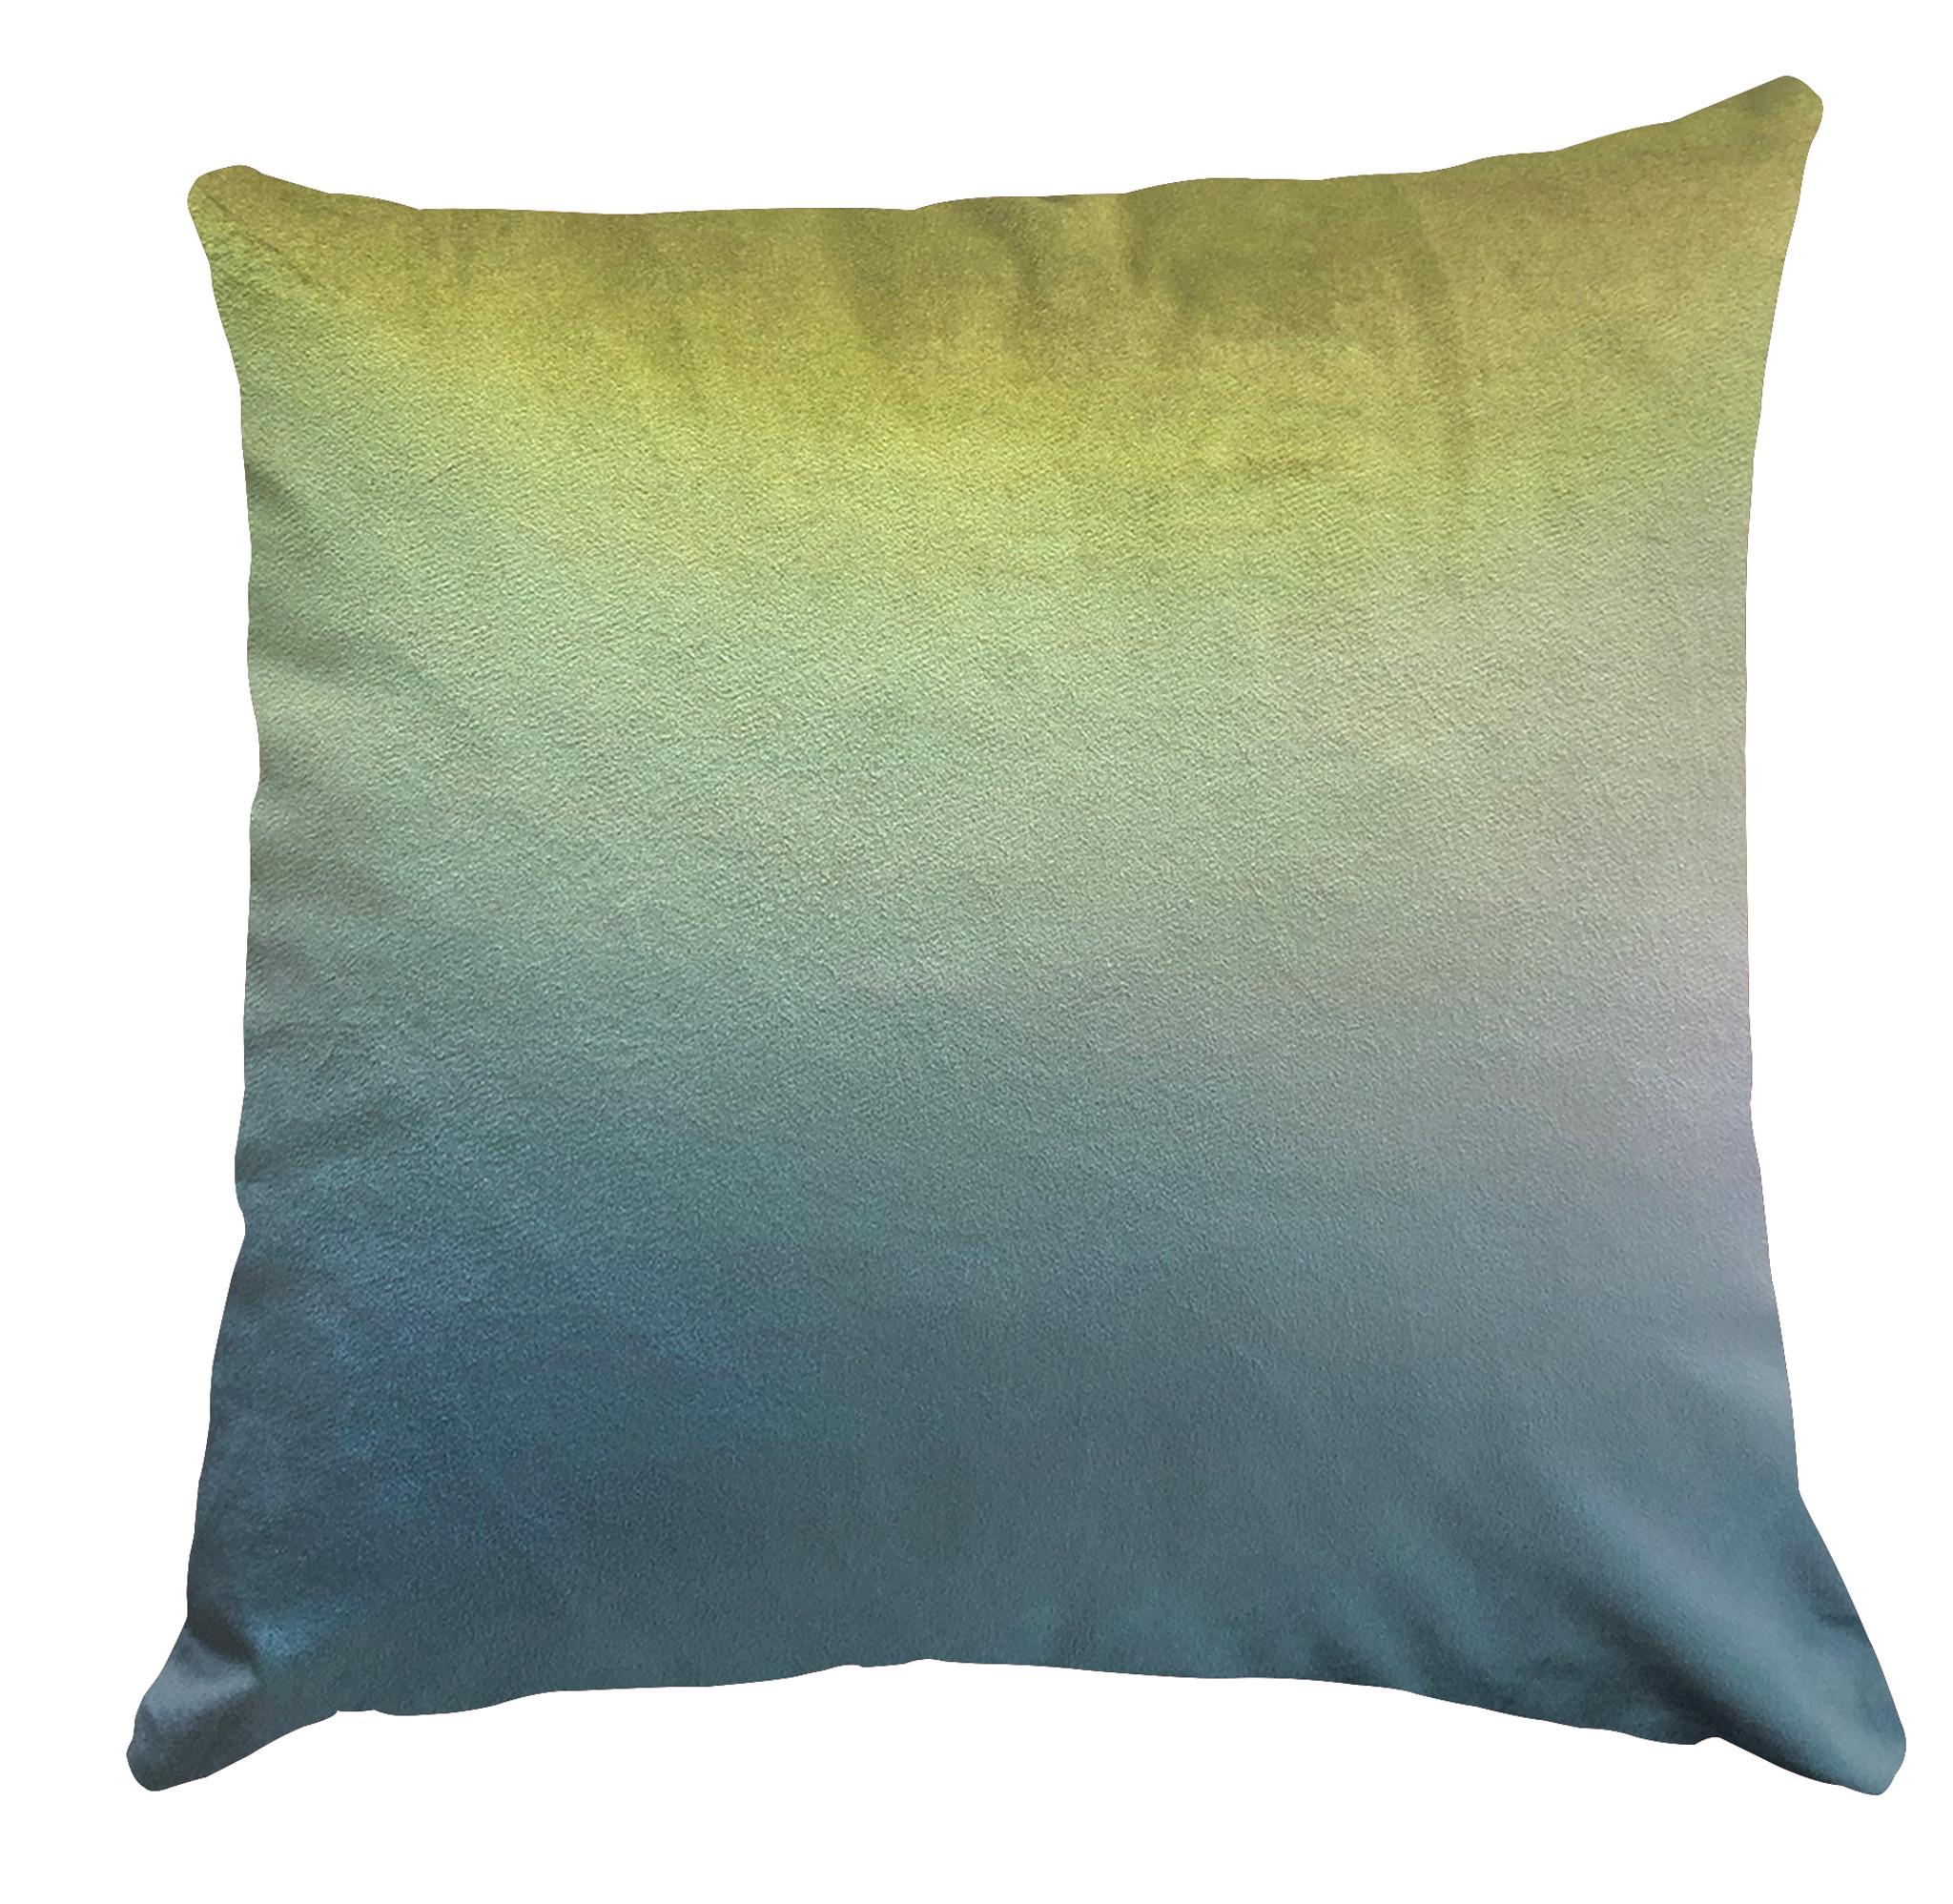 Cushion Cover - Ryokan Dreaming - Destination Acid Lime